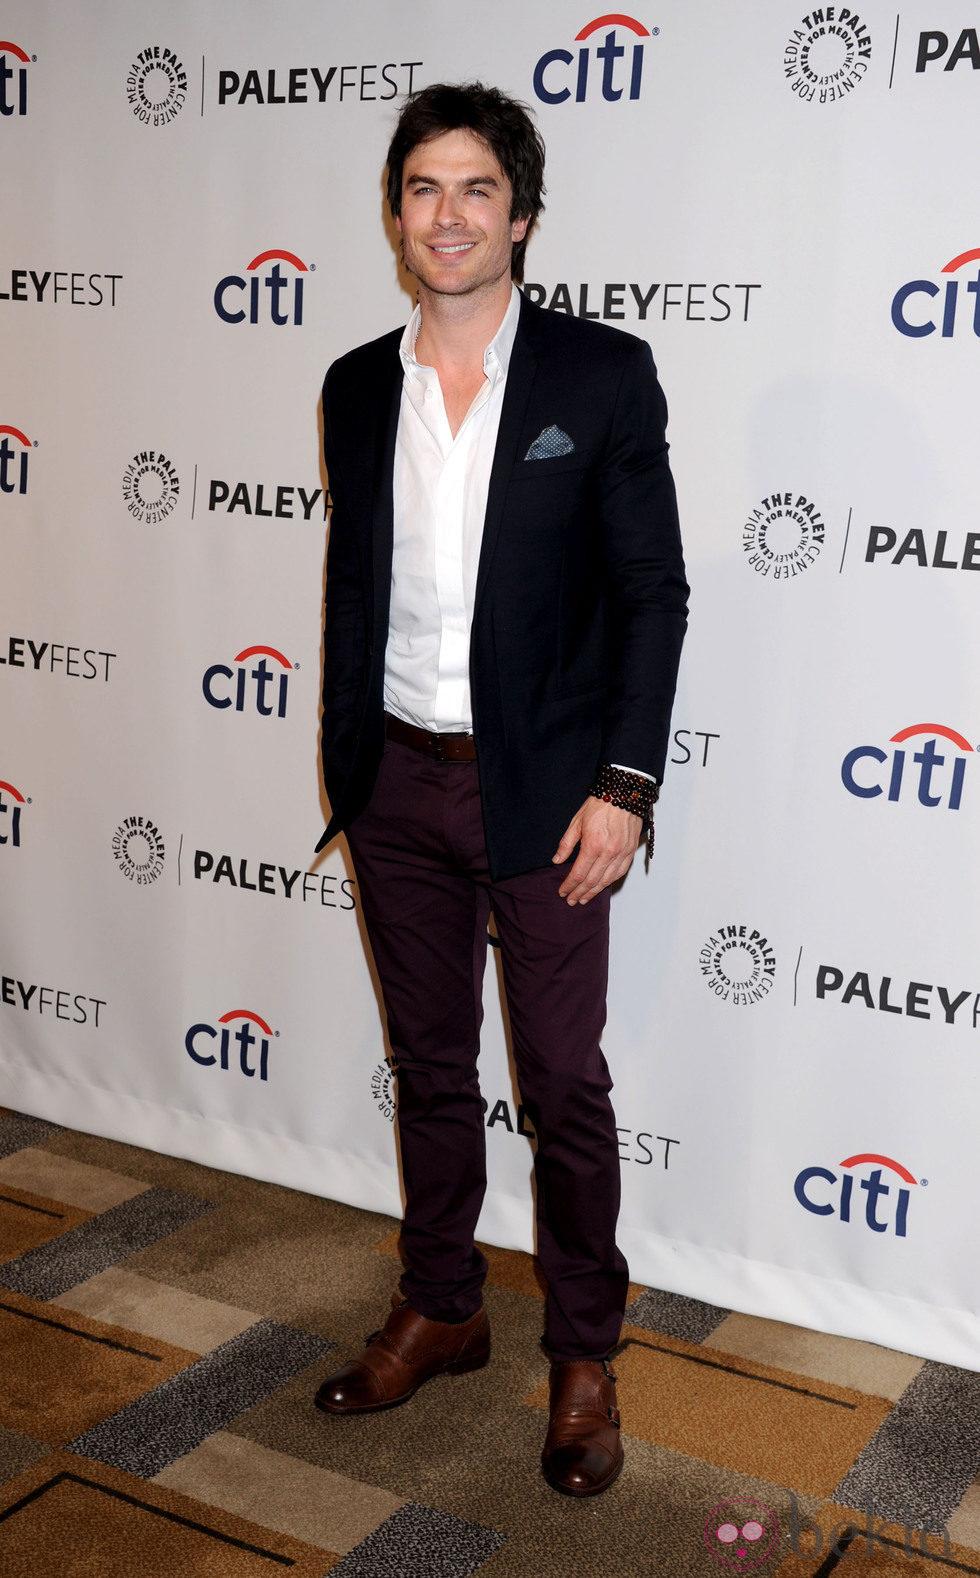 Ian Somerhalder en una fiesta de 'Perdidos' en la PaleyFest 2014